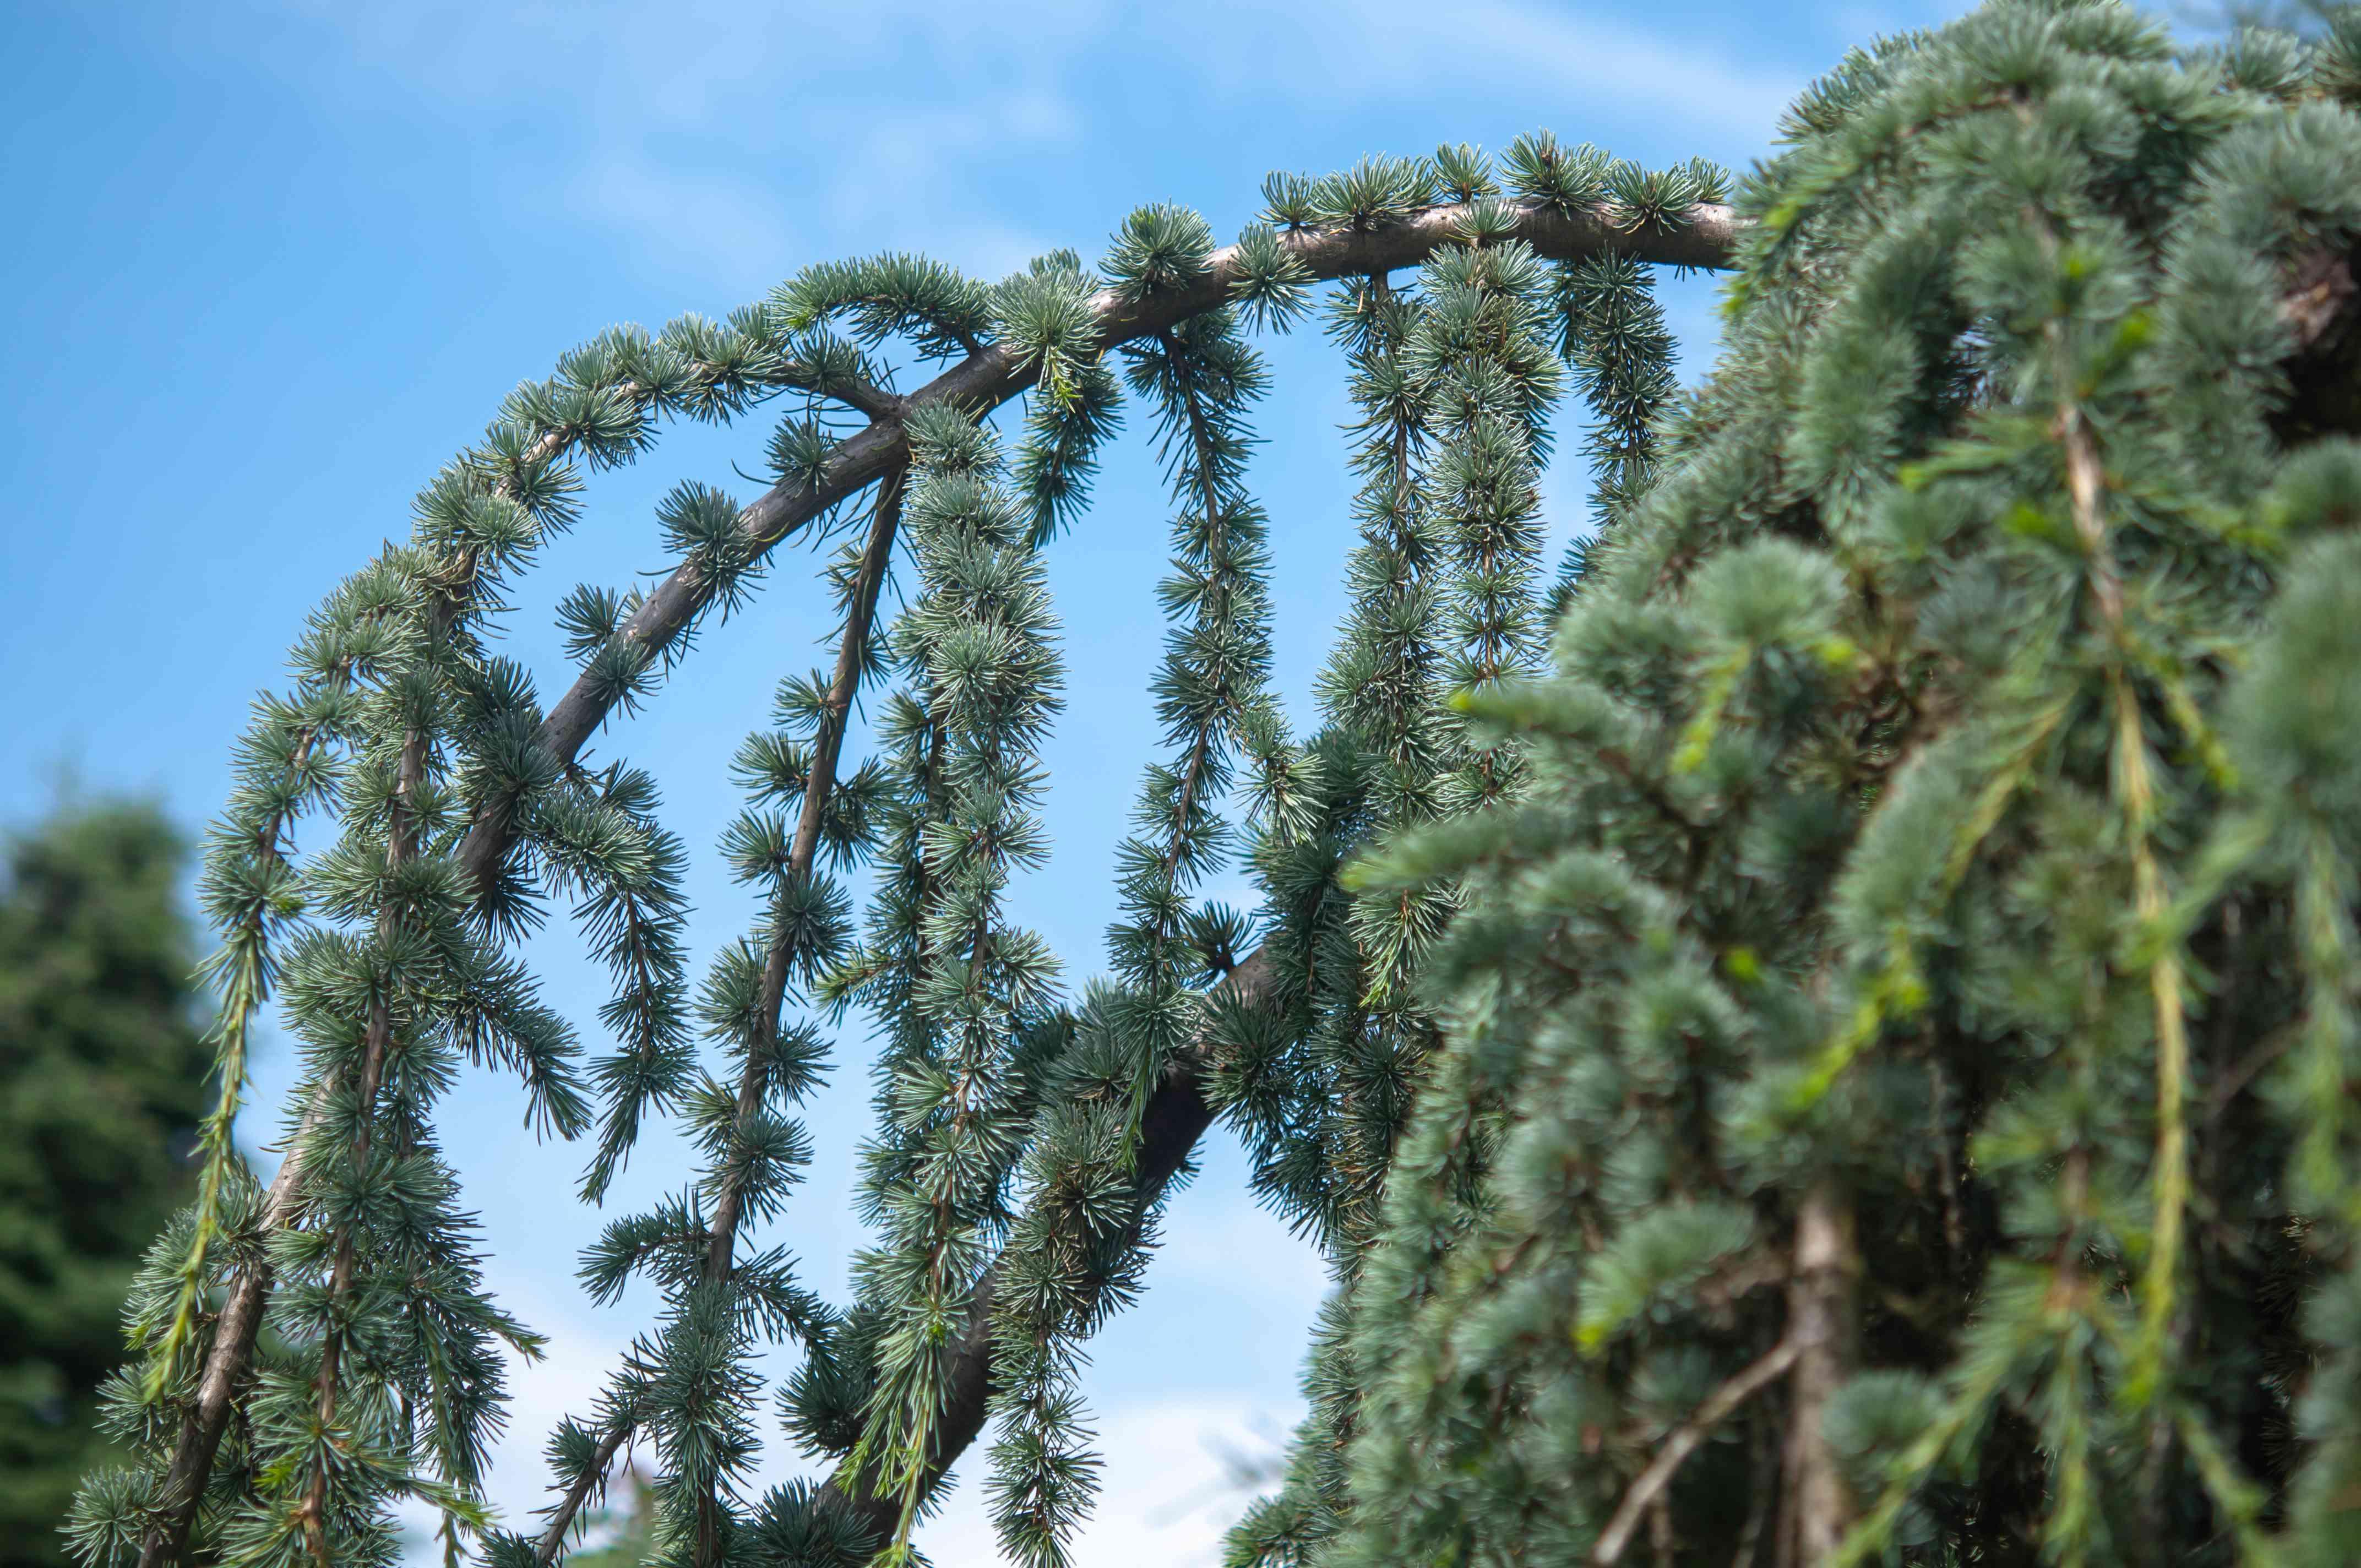 Blue atlas cedar branch with evergreen needle whorls closeup